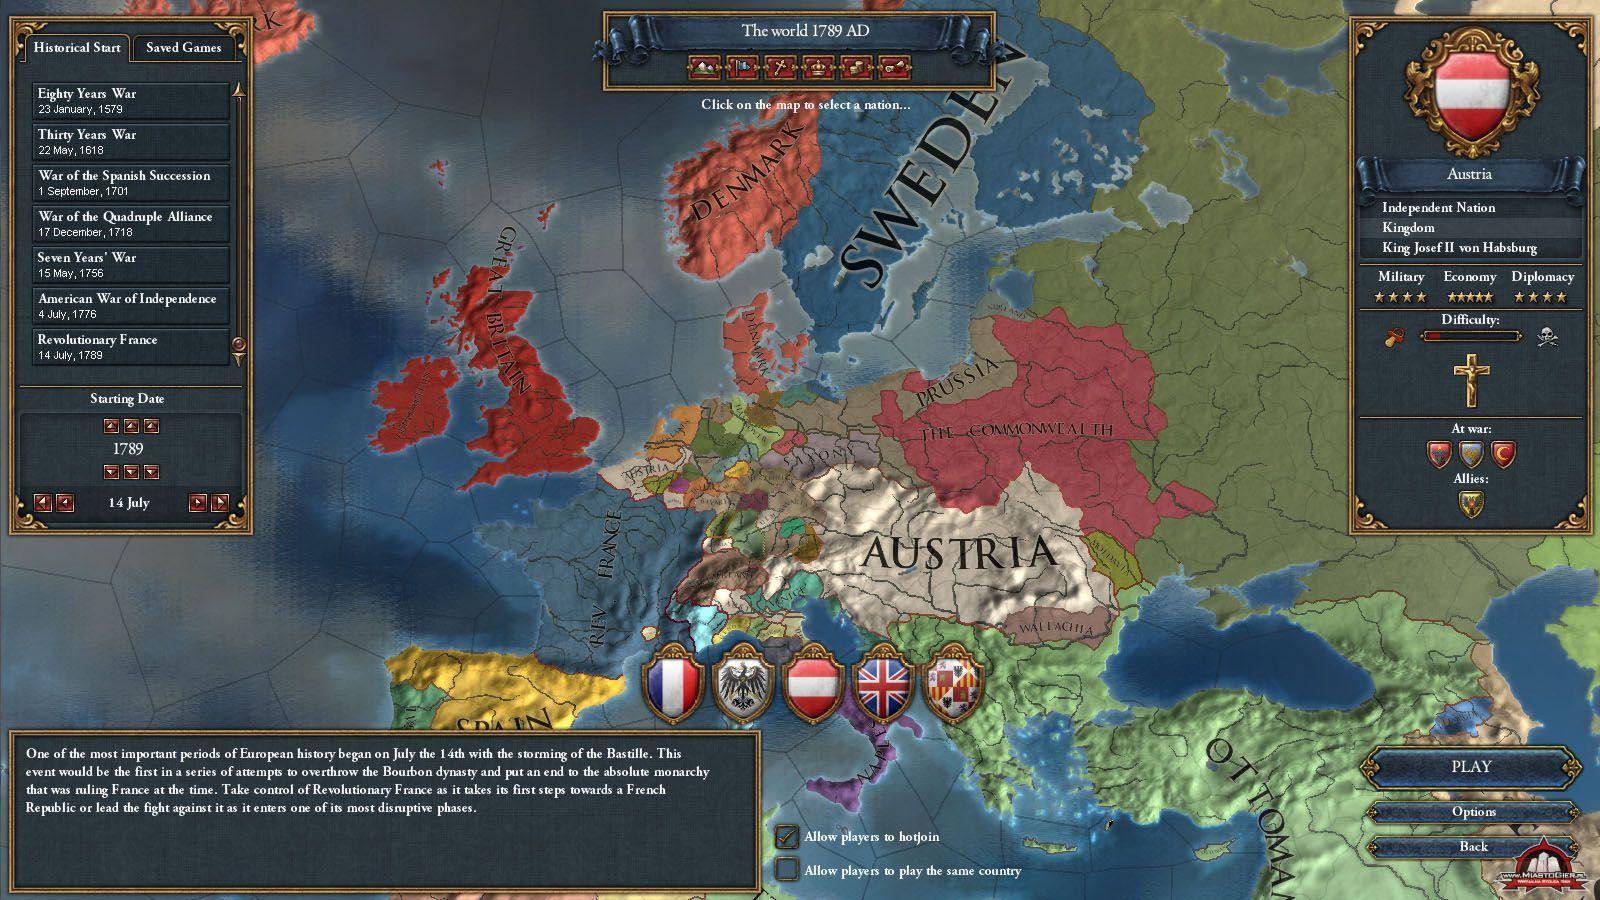 Europa universalis 4 дипломатическая репутация - ca